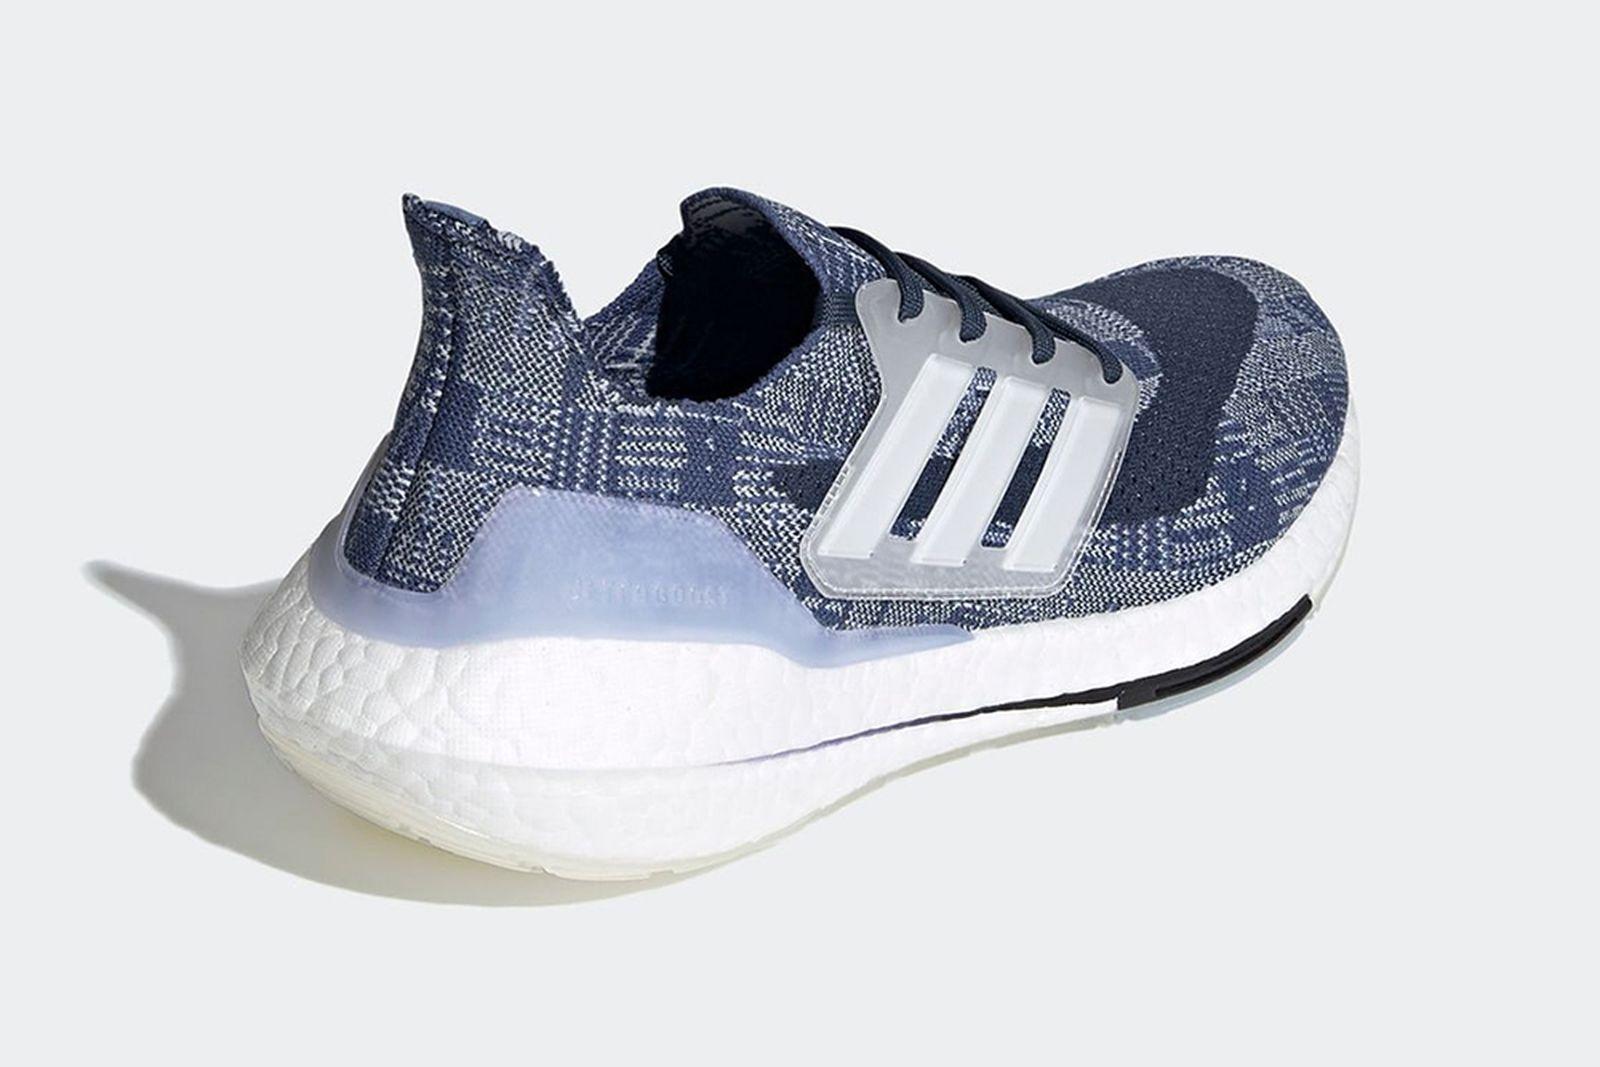 sneaker-news-1-02-22-2021-04